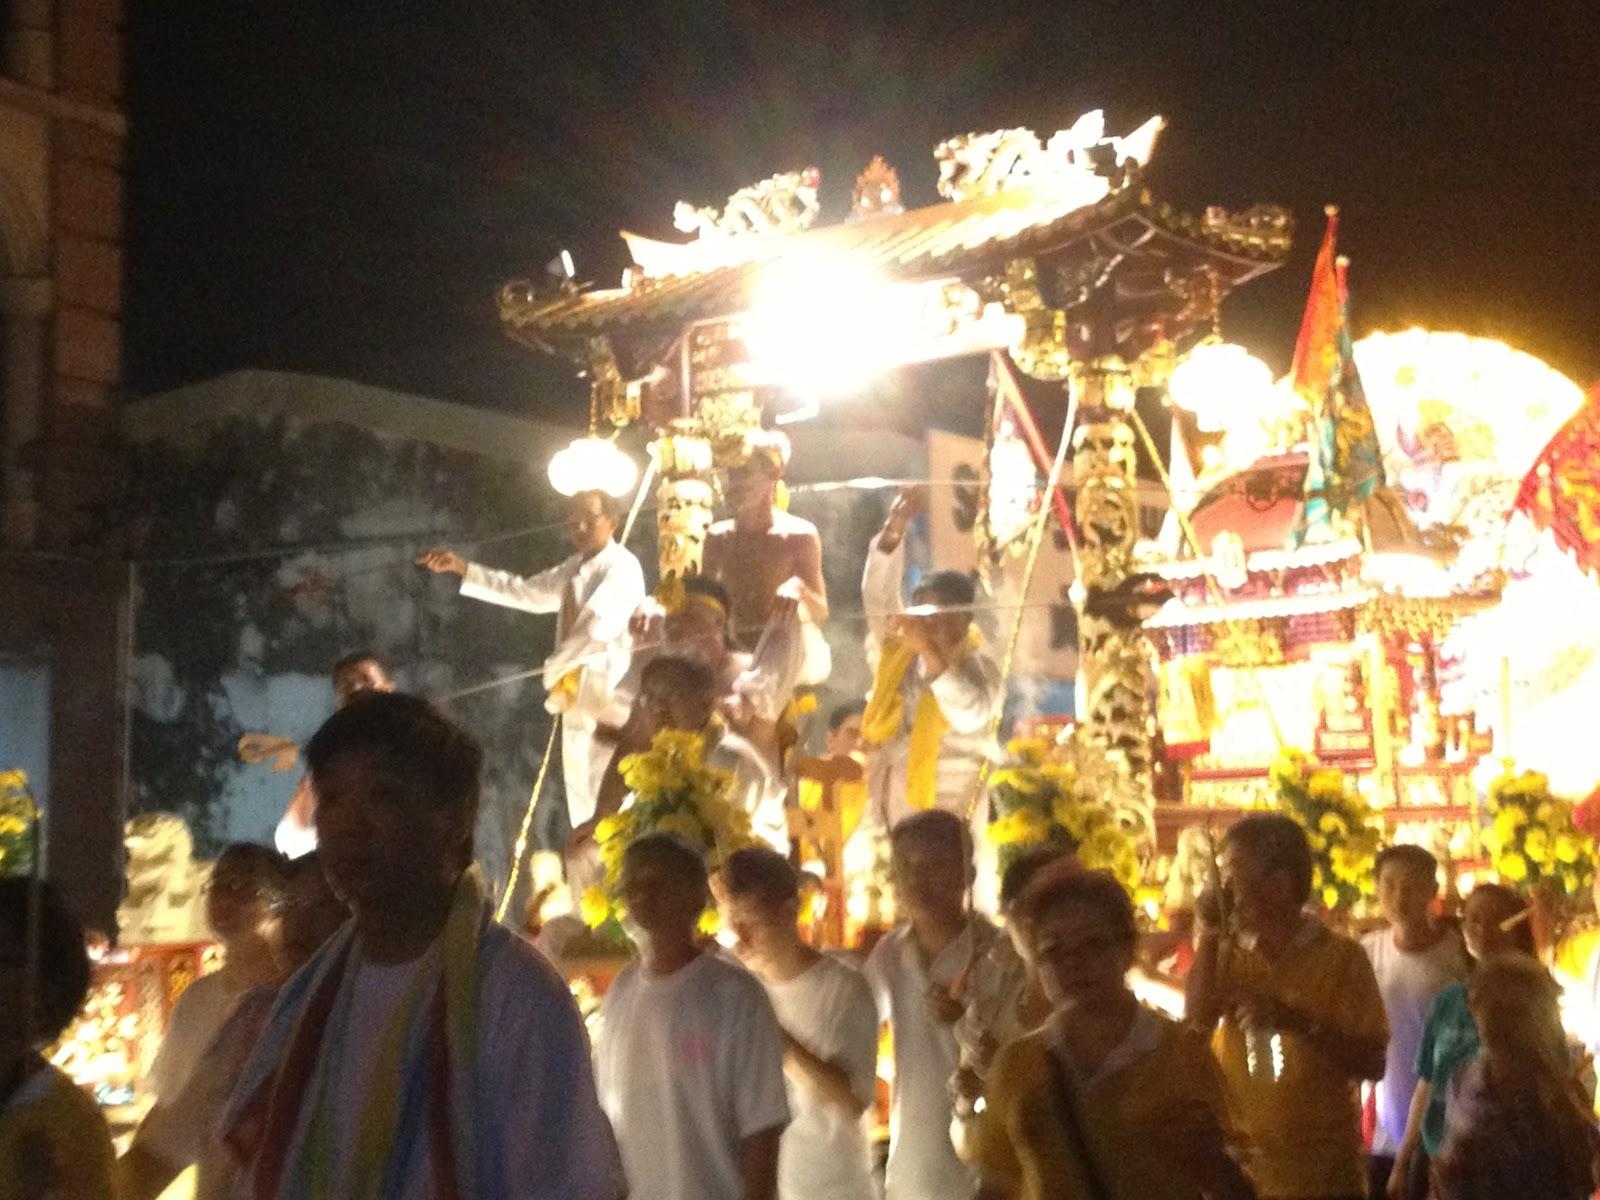 Penang Private Tour Guide Nine Emperor Gods Celebration In Penang